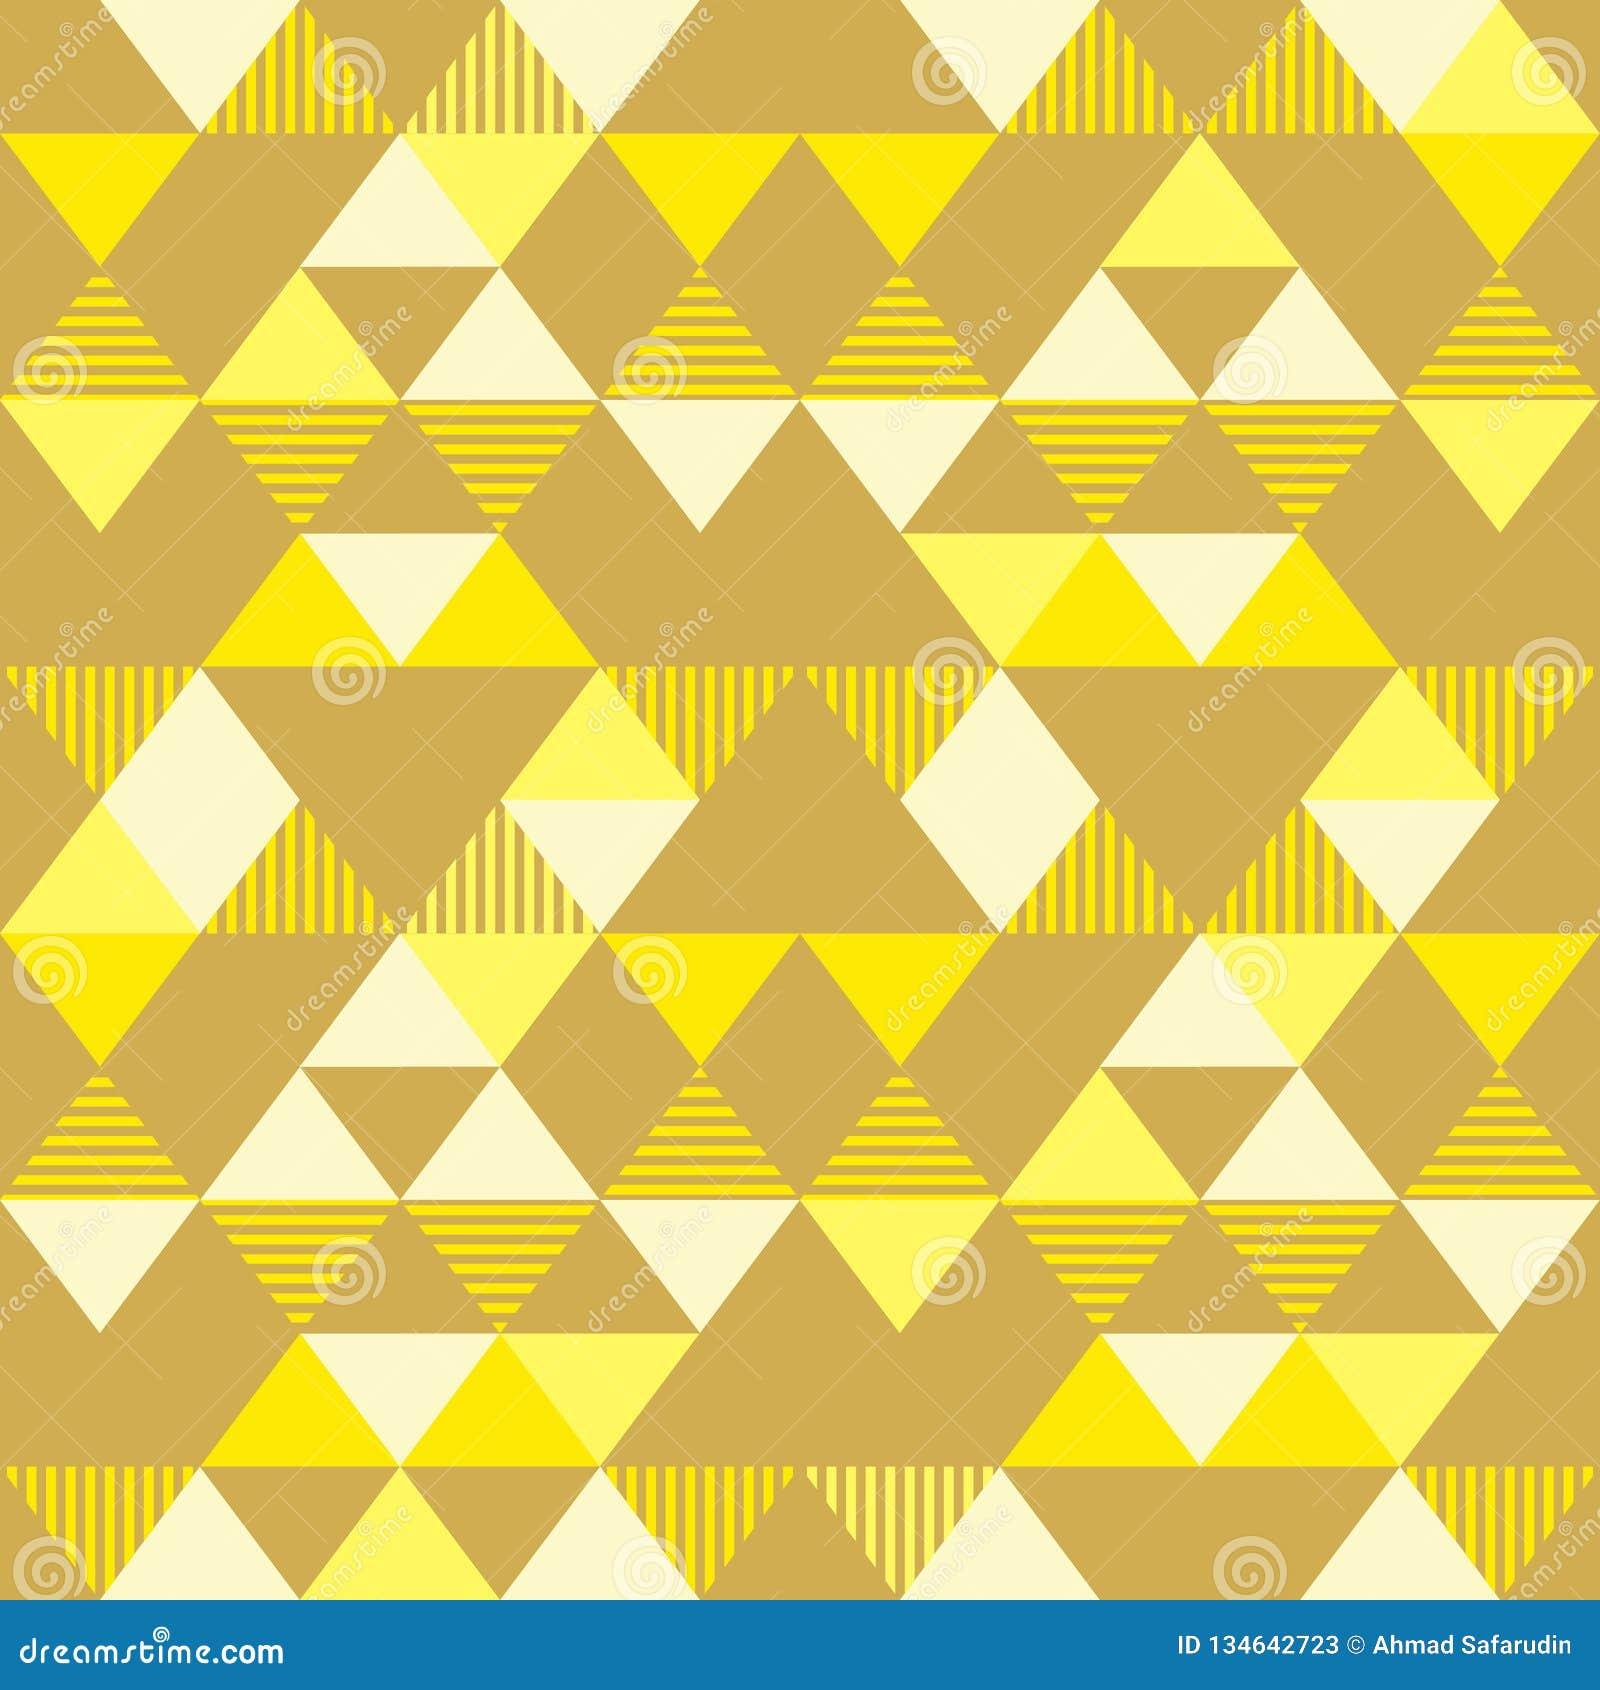 Golden Yellow Seamless Geometric Triangle Pattern Background